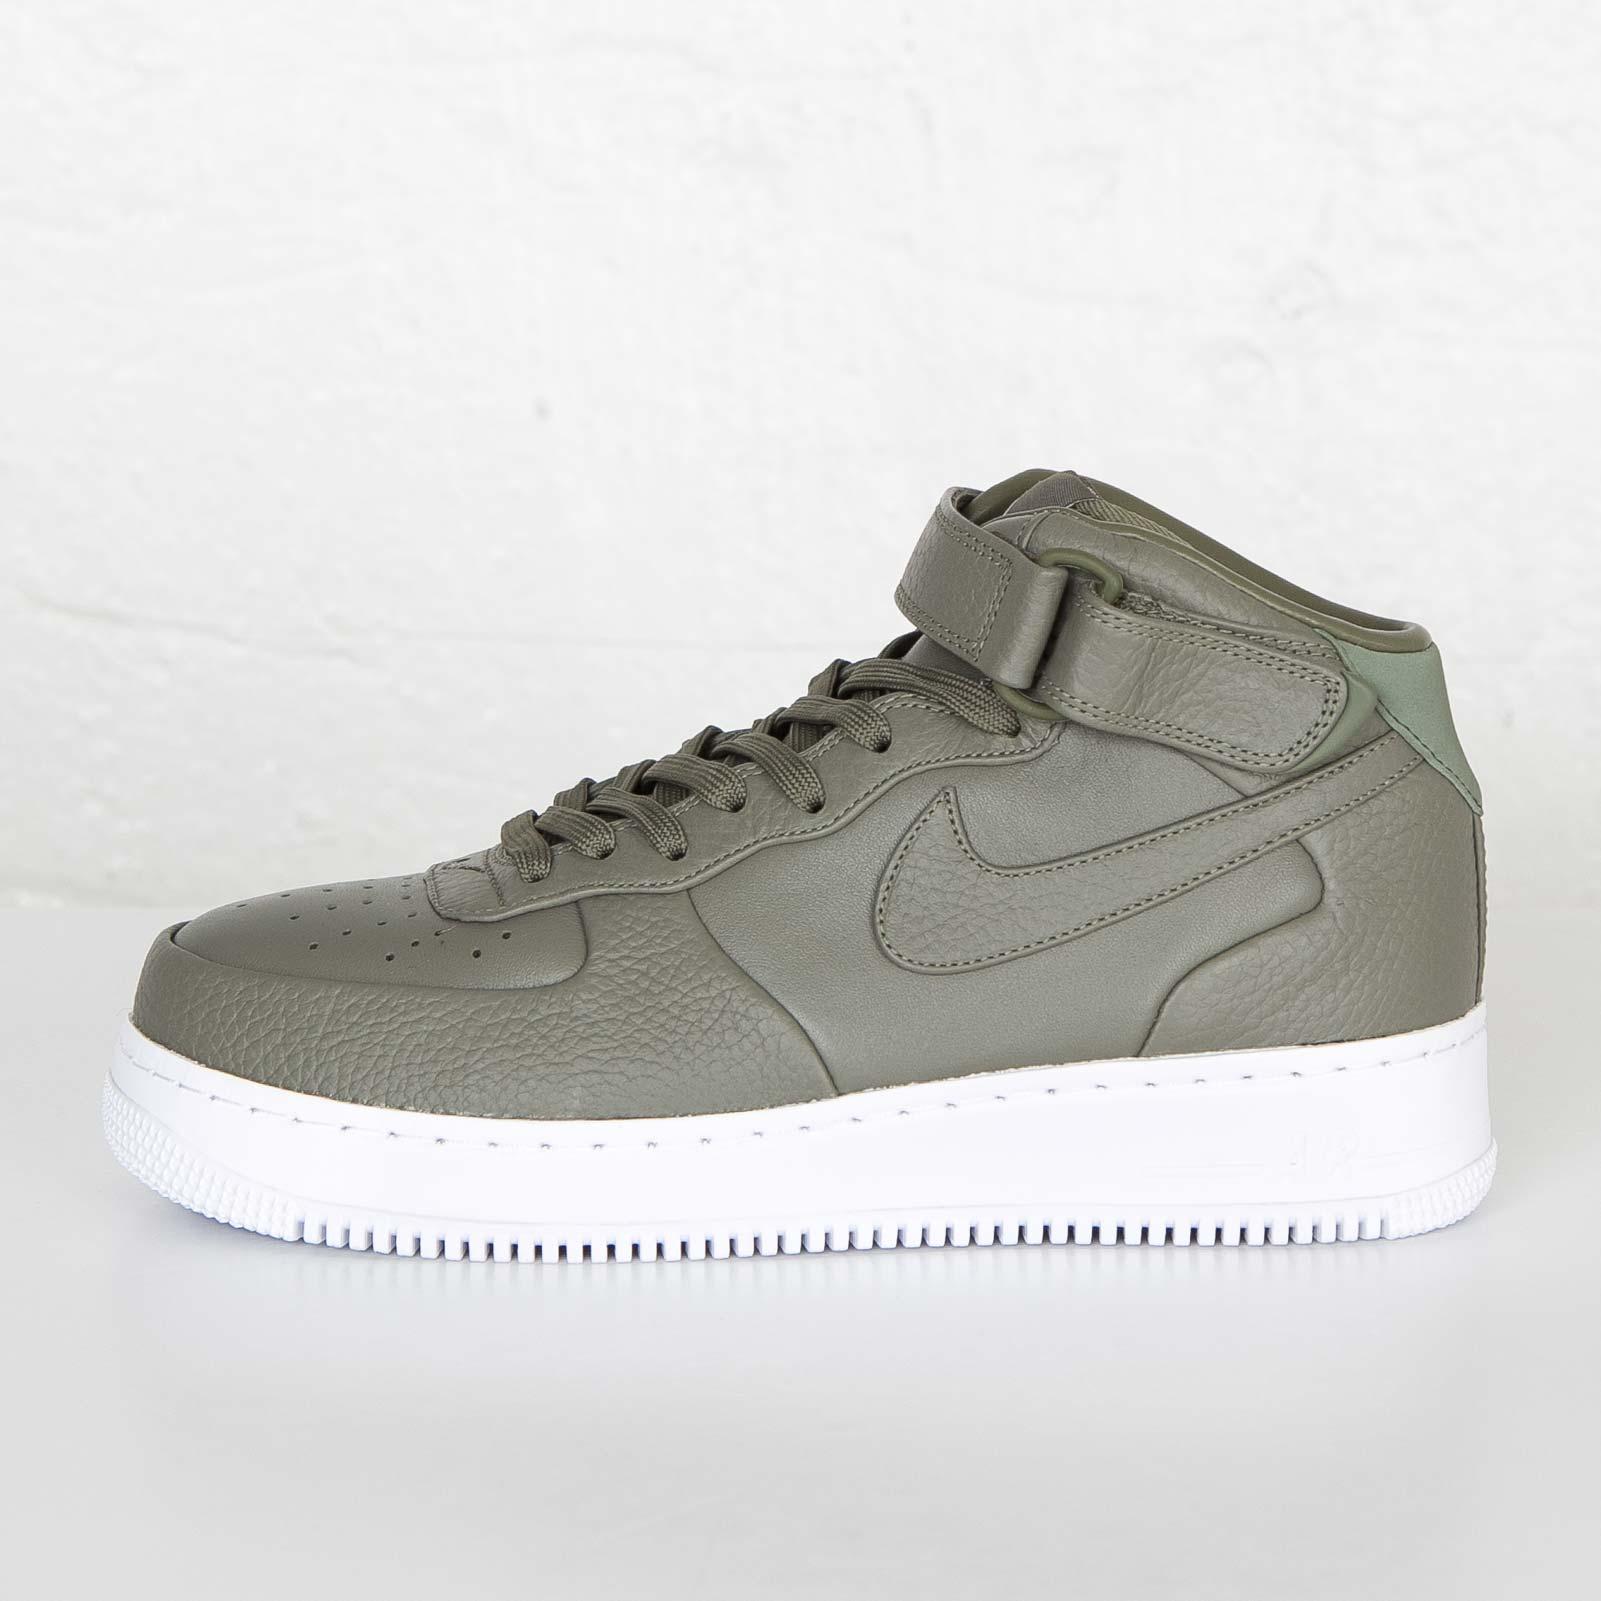 promo code 2cf46 04c89 Nike NikeLab Air Force 1 Mid - 6. Close